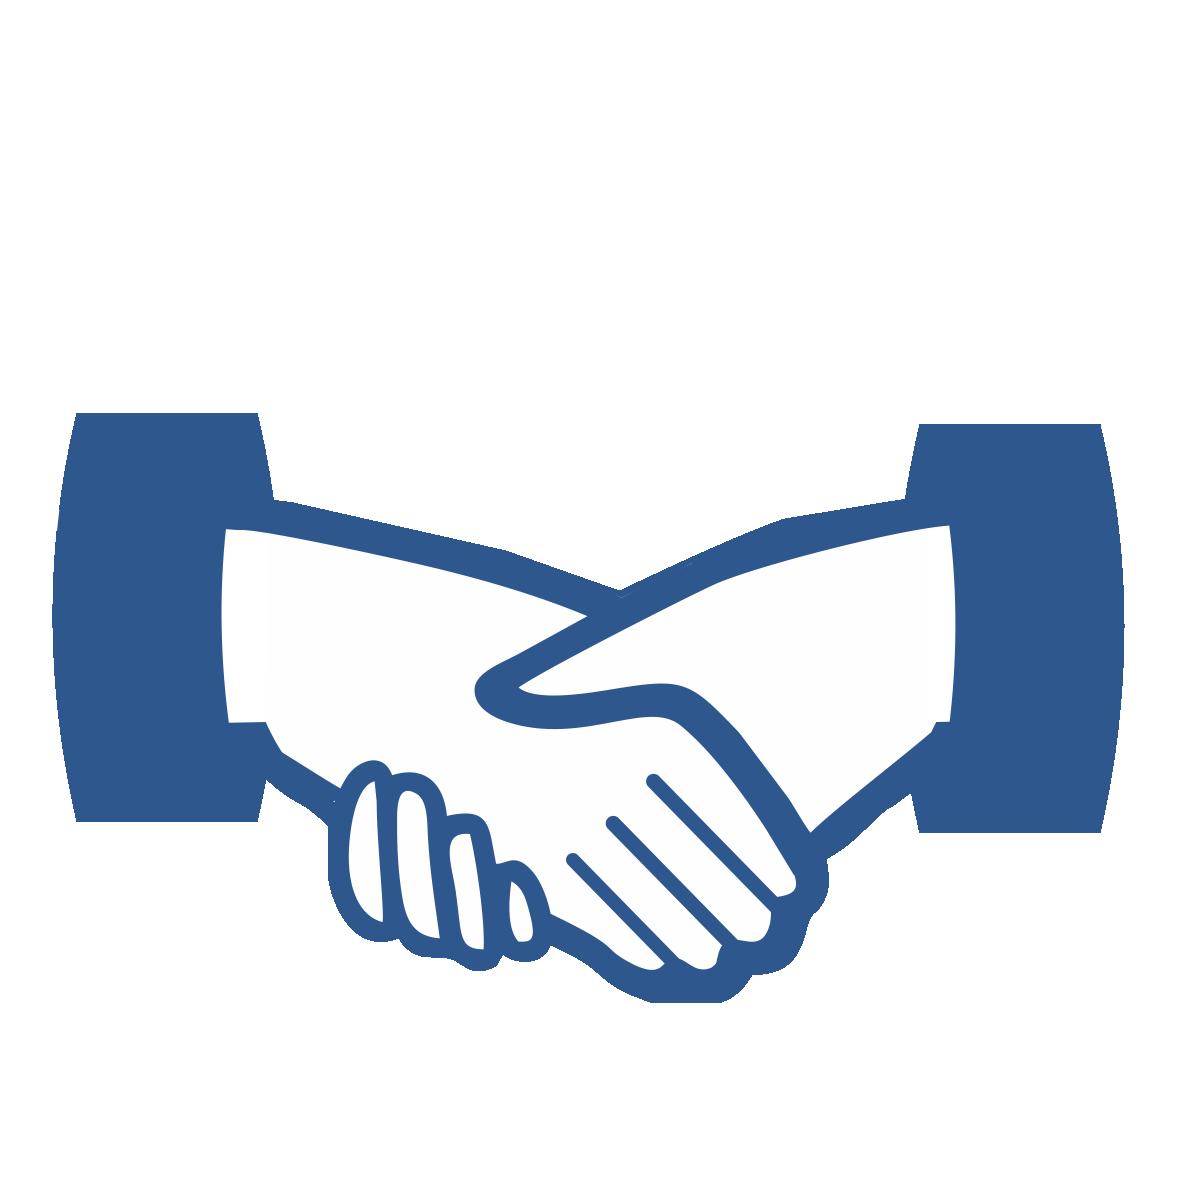 partners. Handshake clipart dignity